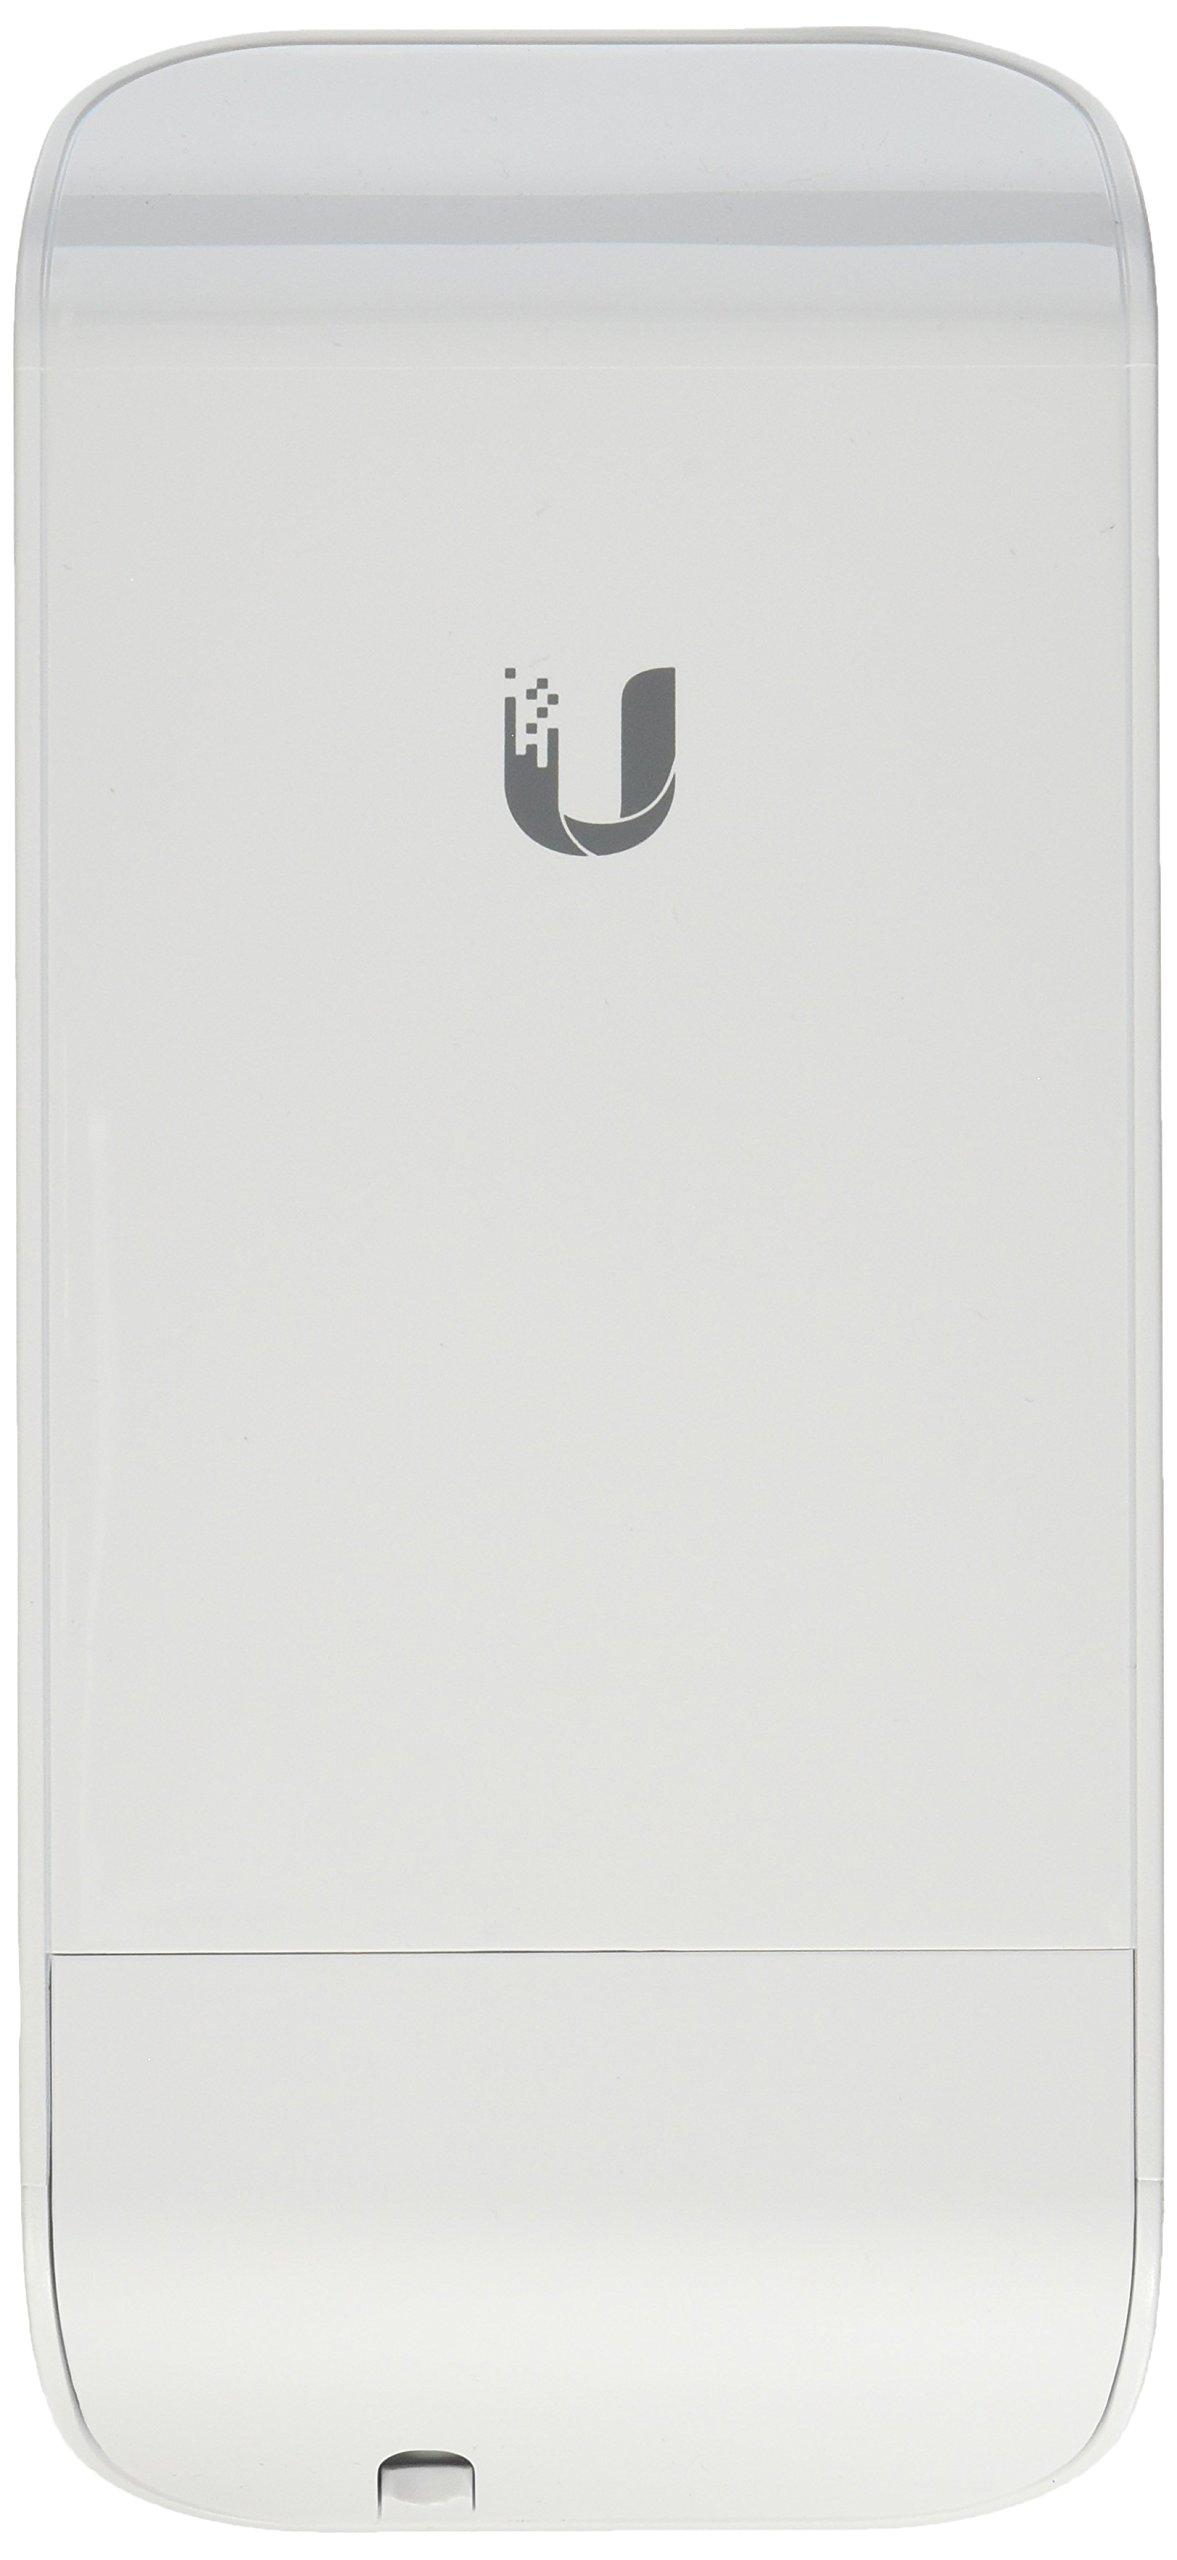 Ubiquiti NanoStation loco M5 - Wireless Access Point - AirMax (LOCOM5US) by Ubiquiti Networks